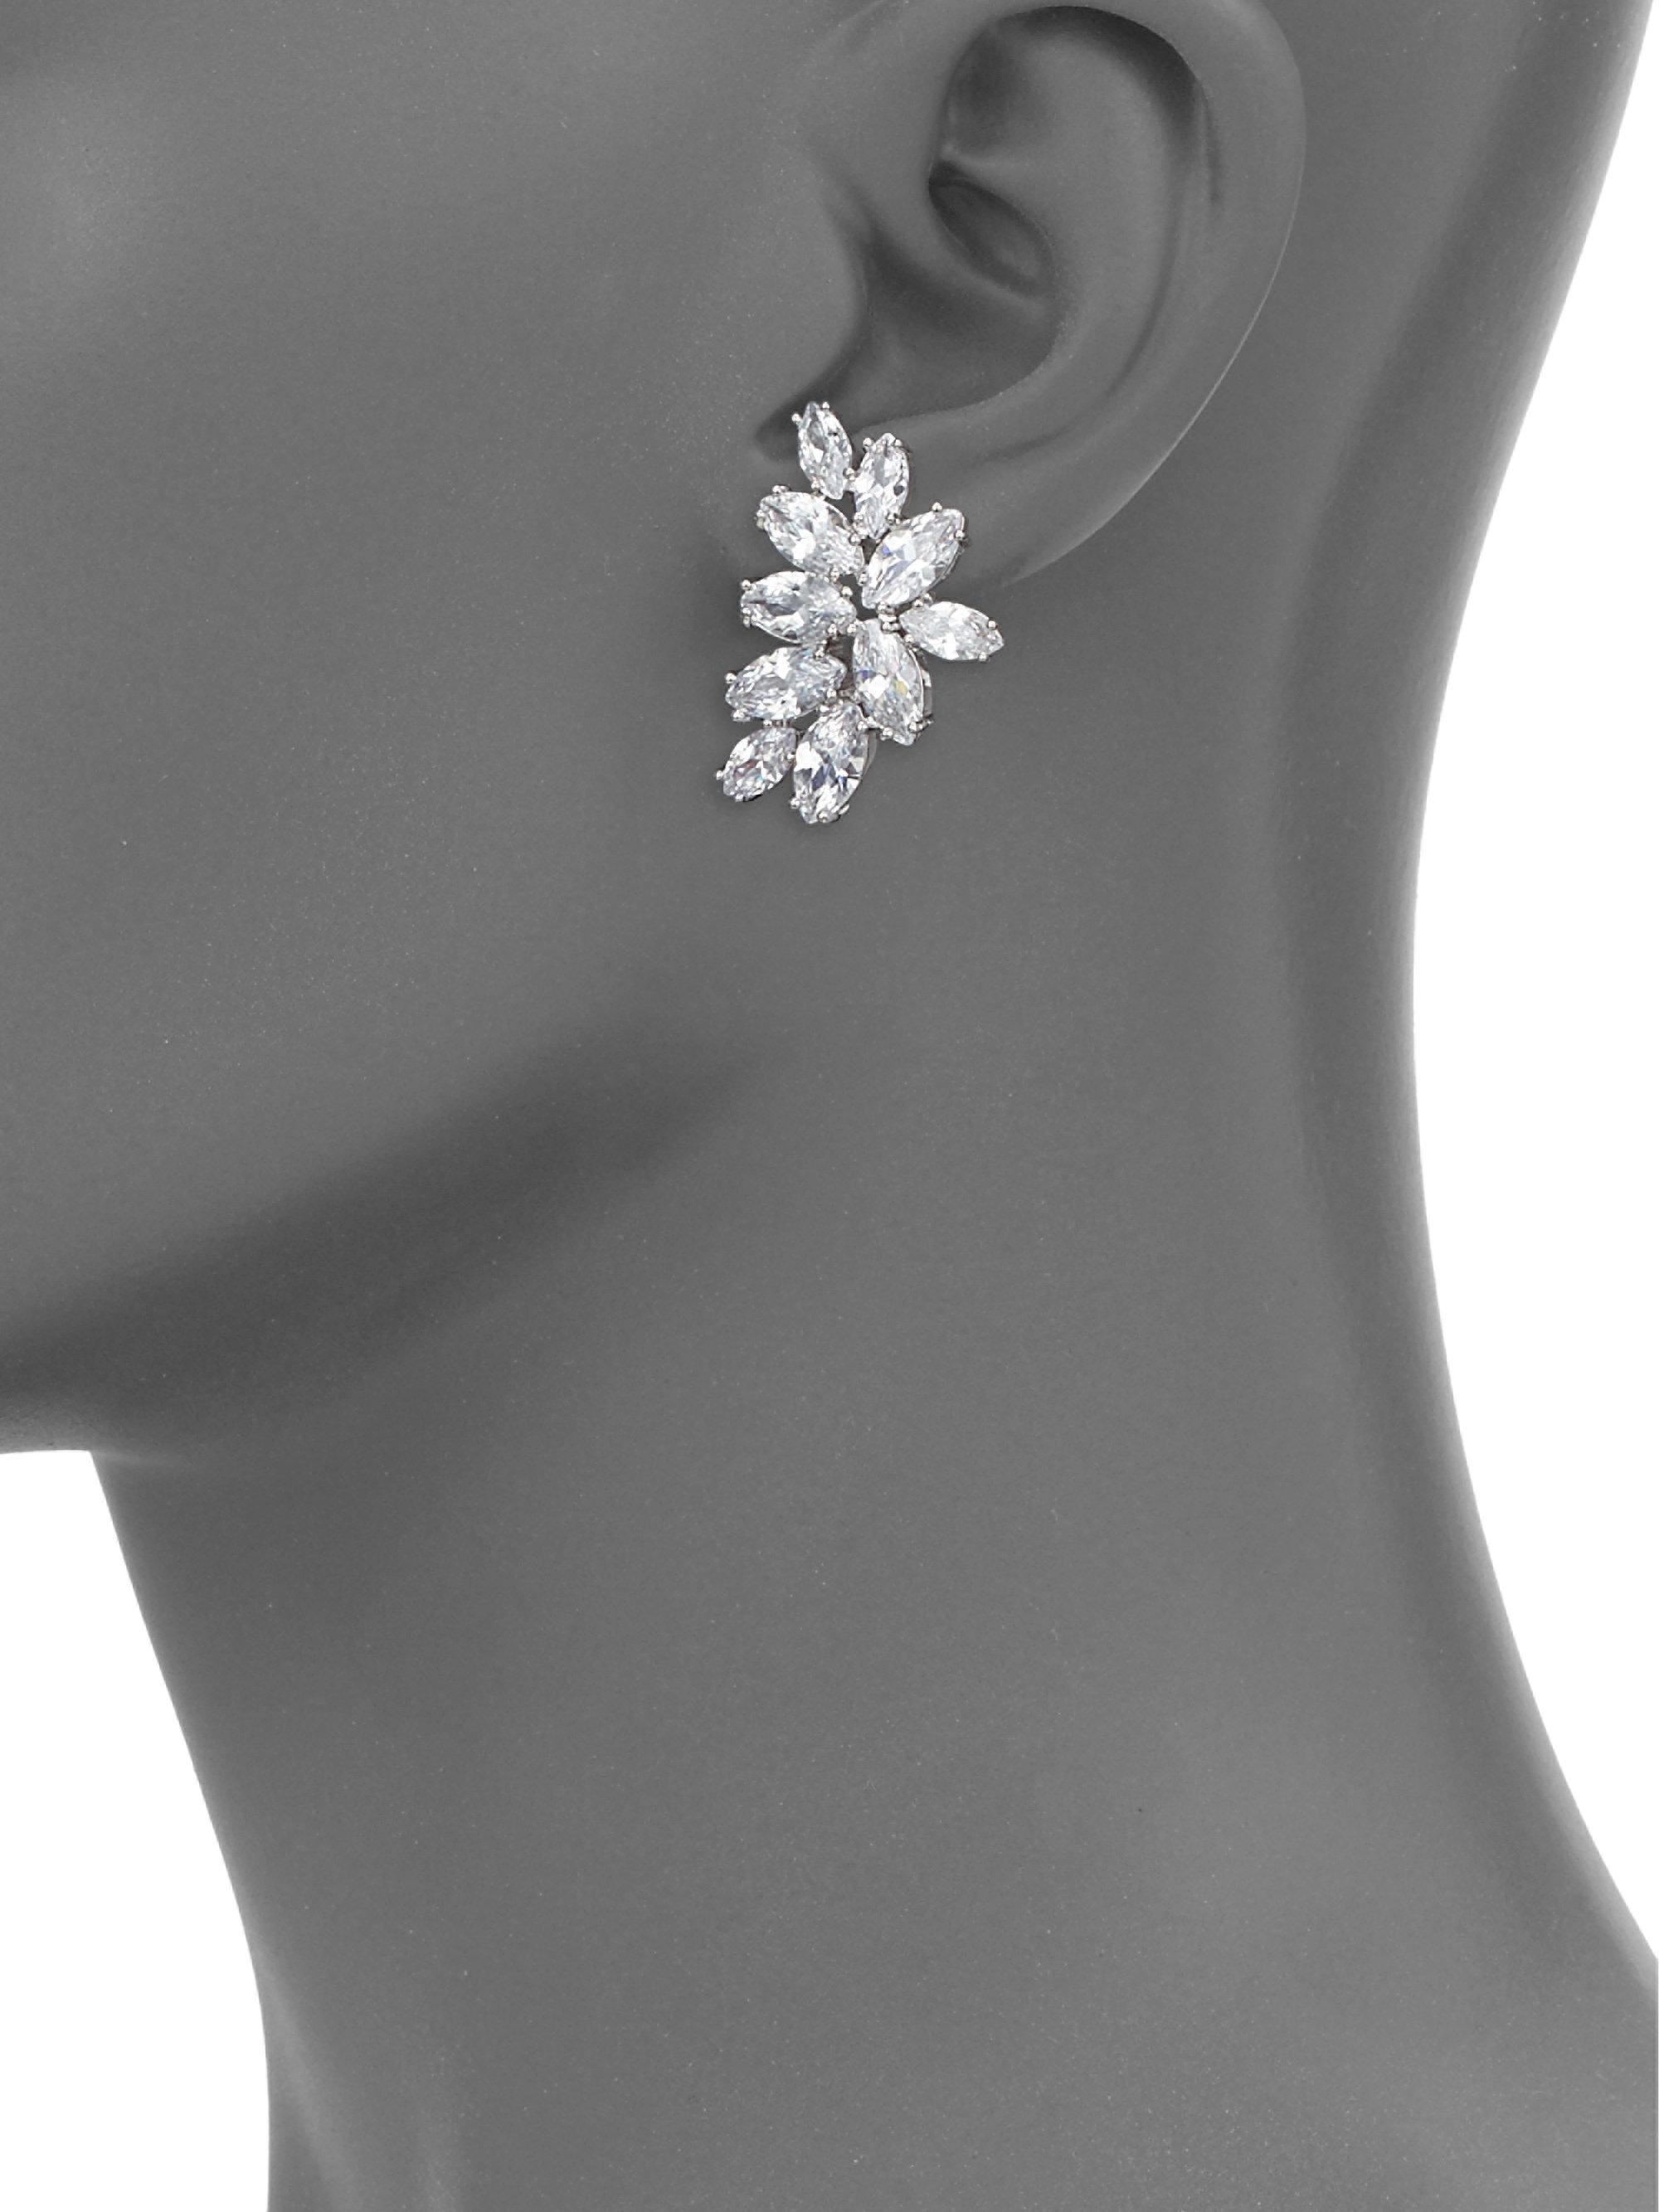 Fallon Monarch Mini Cluster Crystal Earrings uOx5OJAuzi